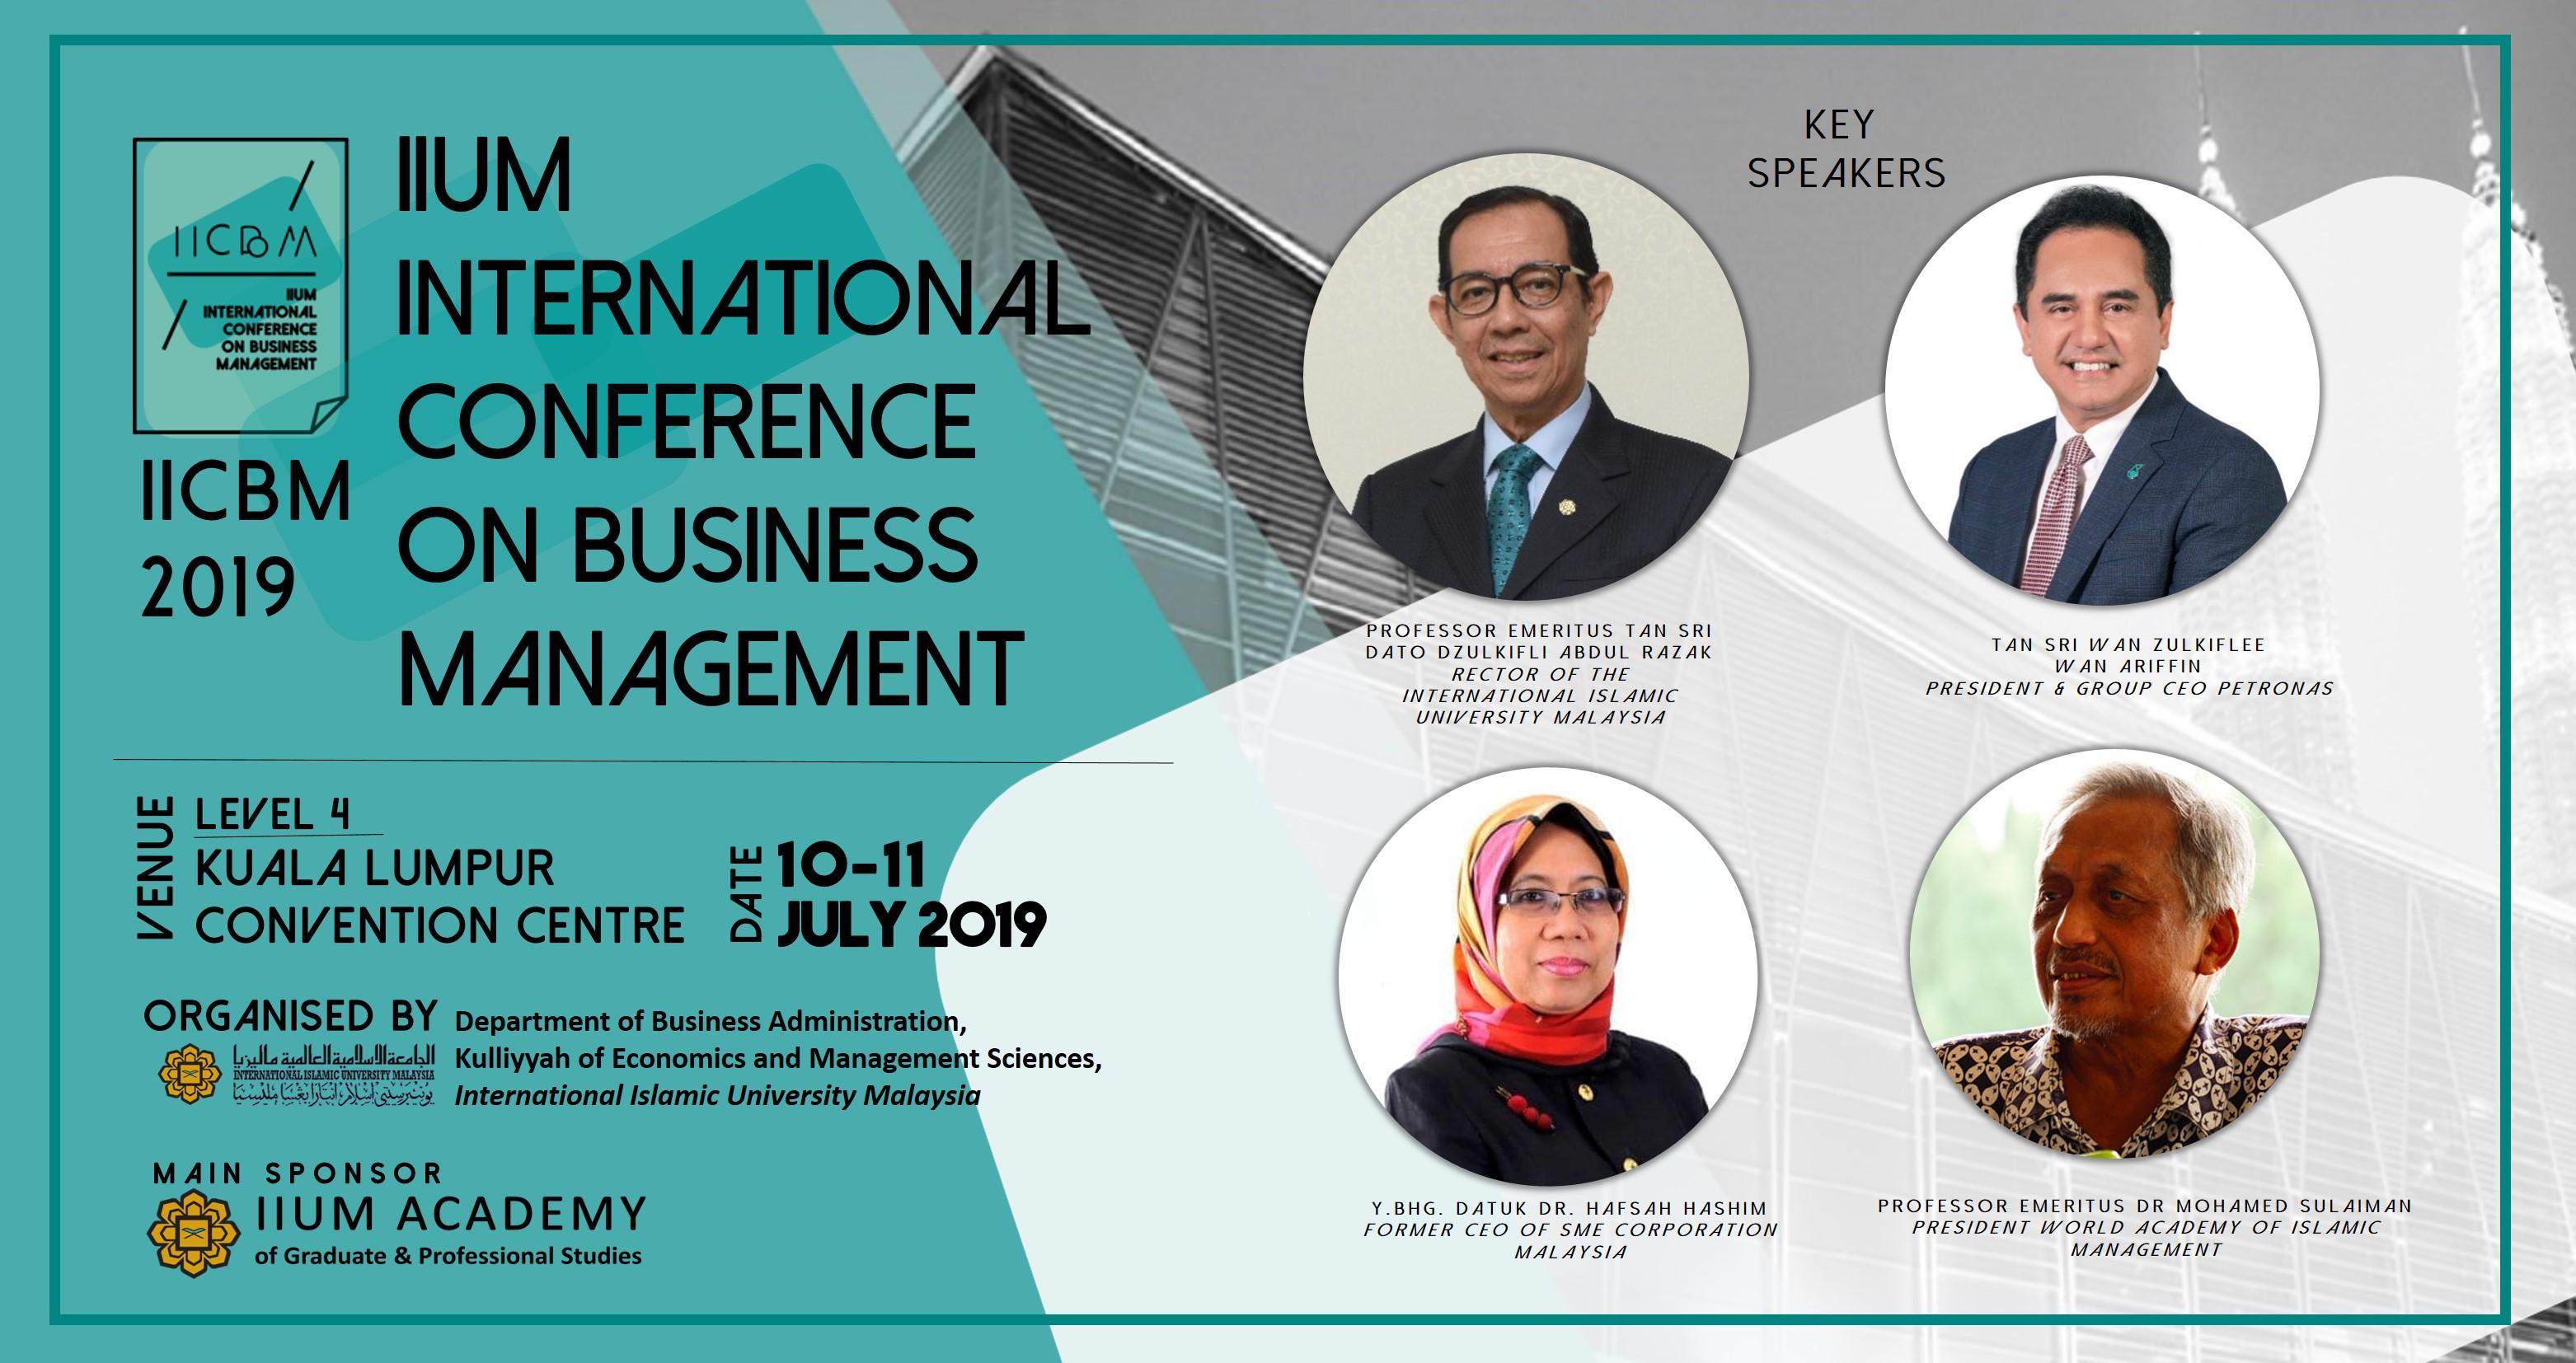 IIUM International Conference on Business Management (IICBM 2019)